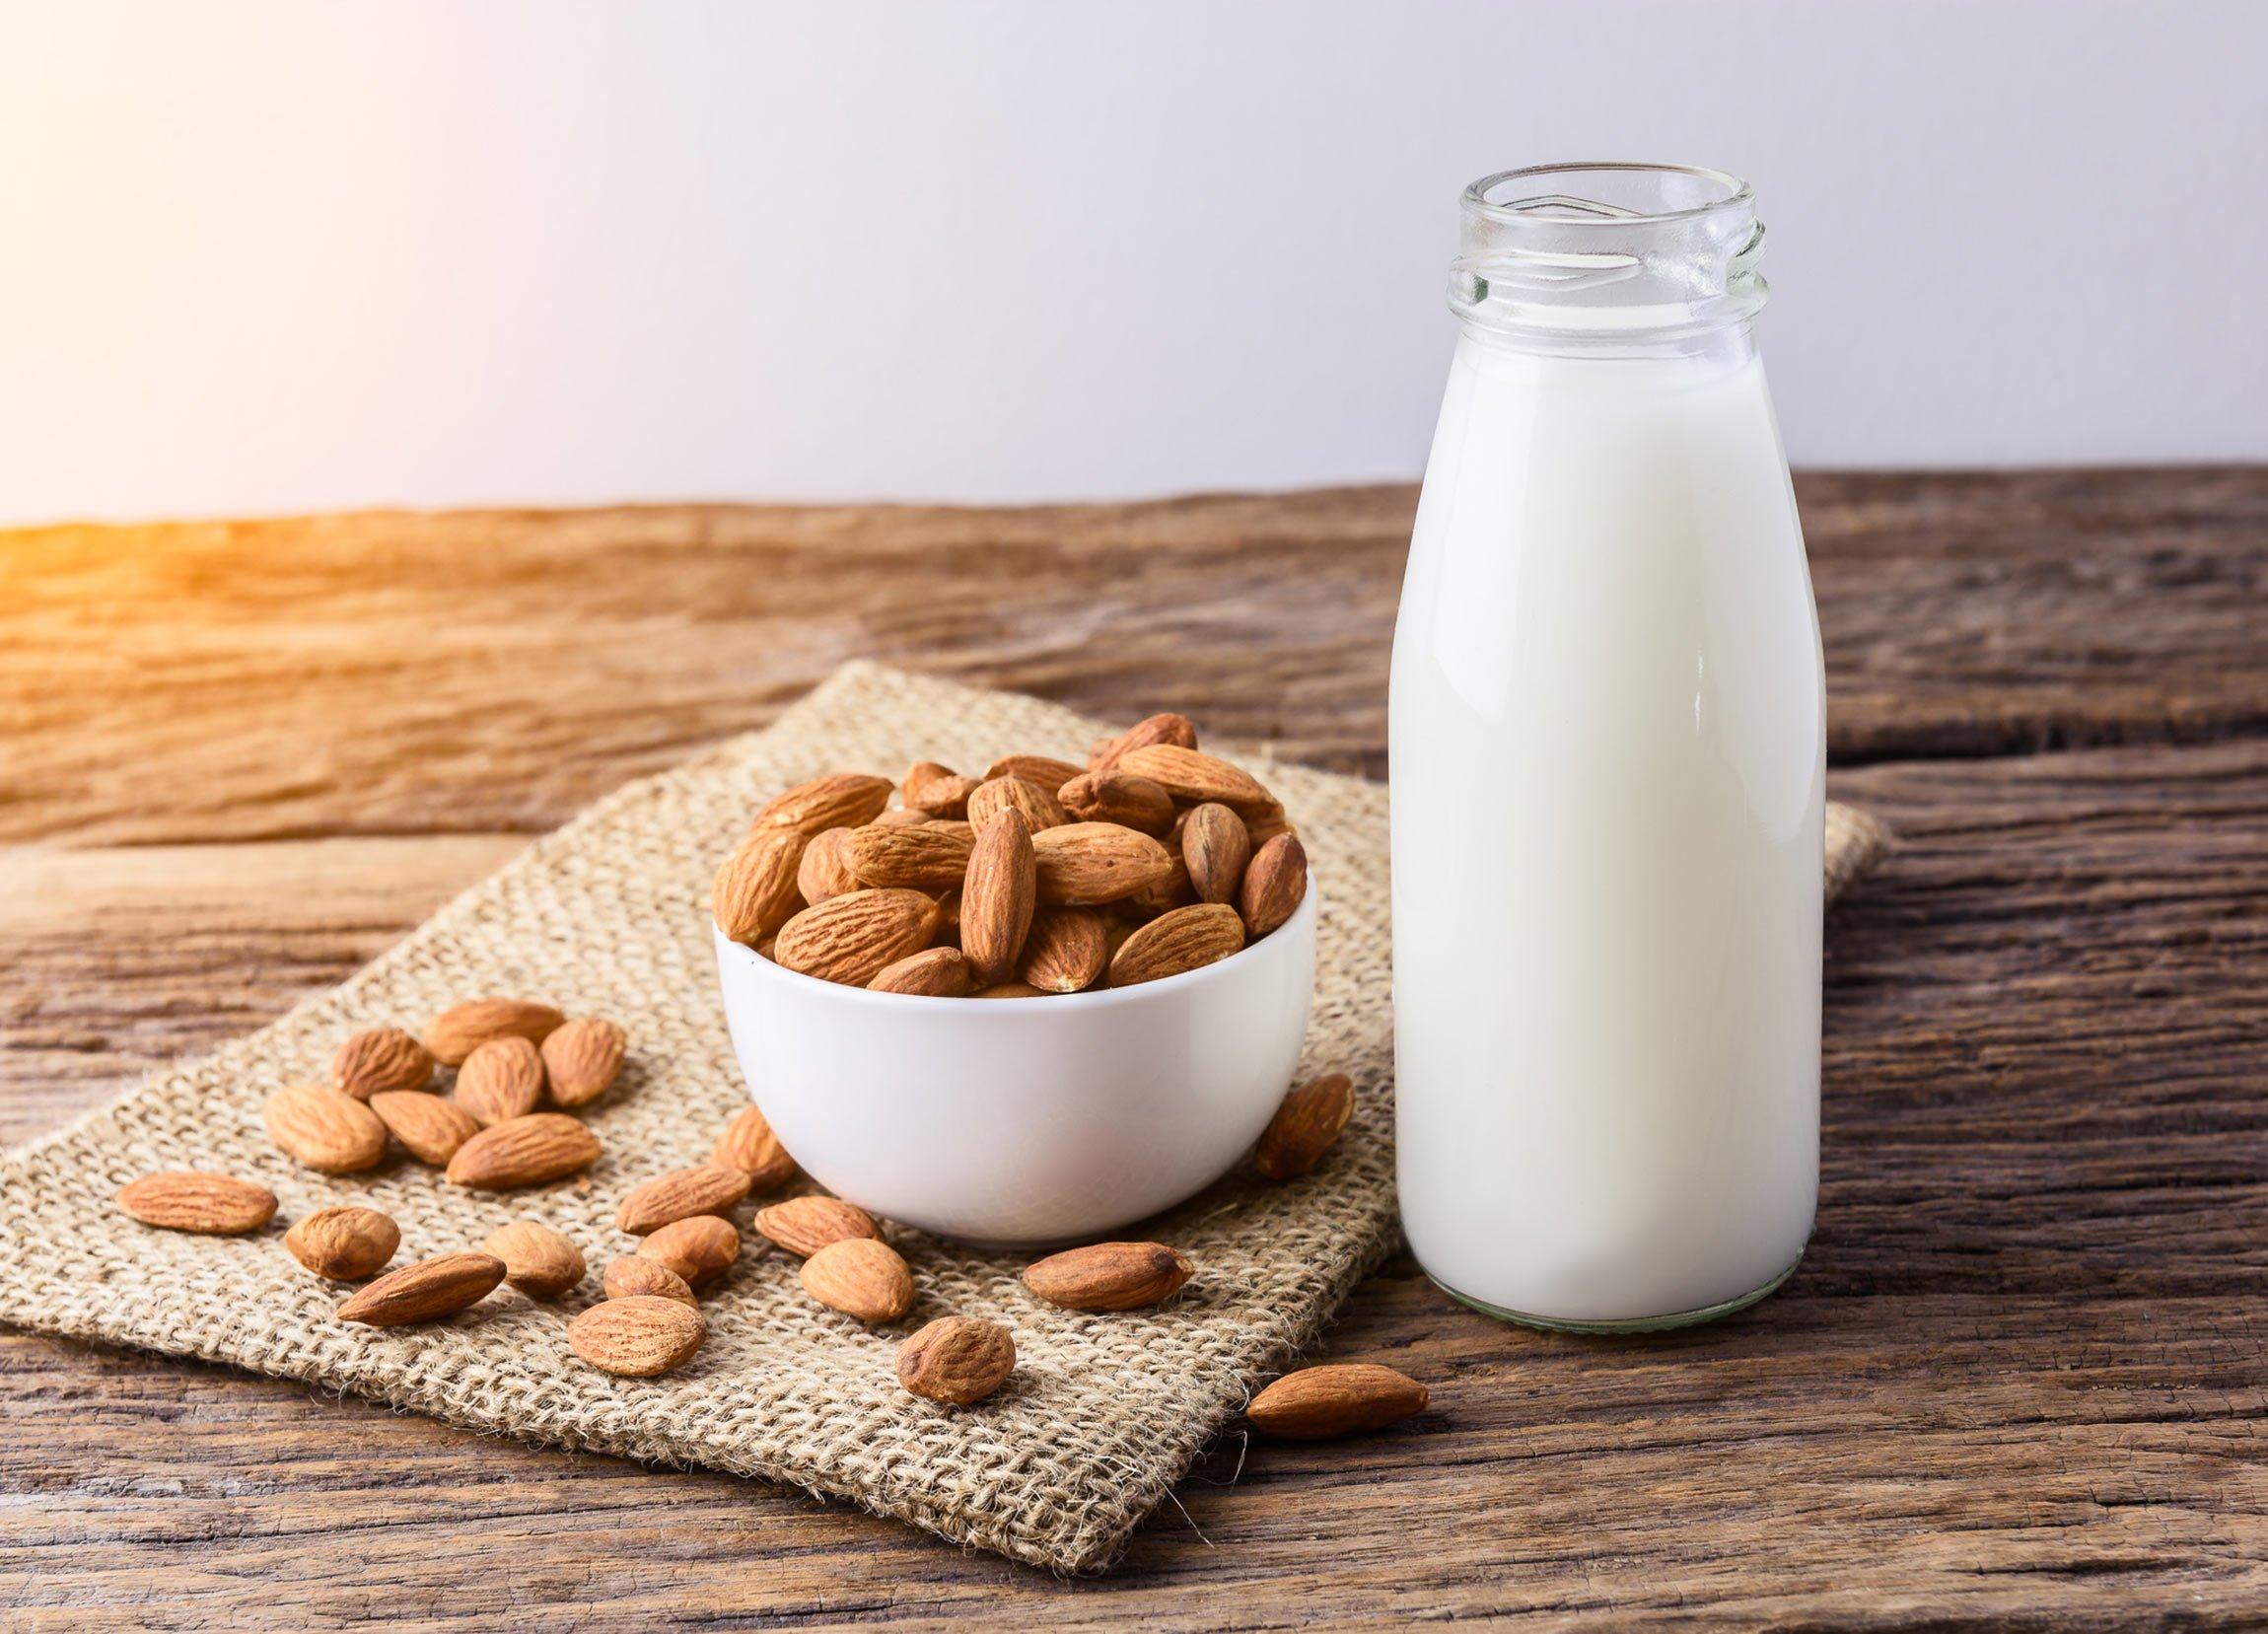 health benefits of almonds: type 2 diabetes